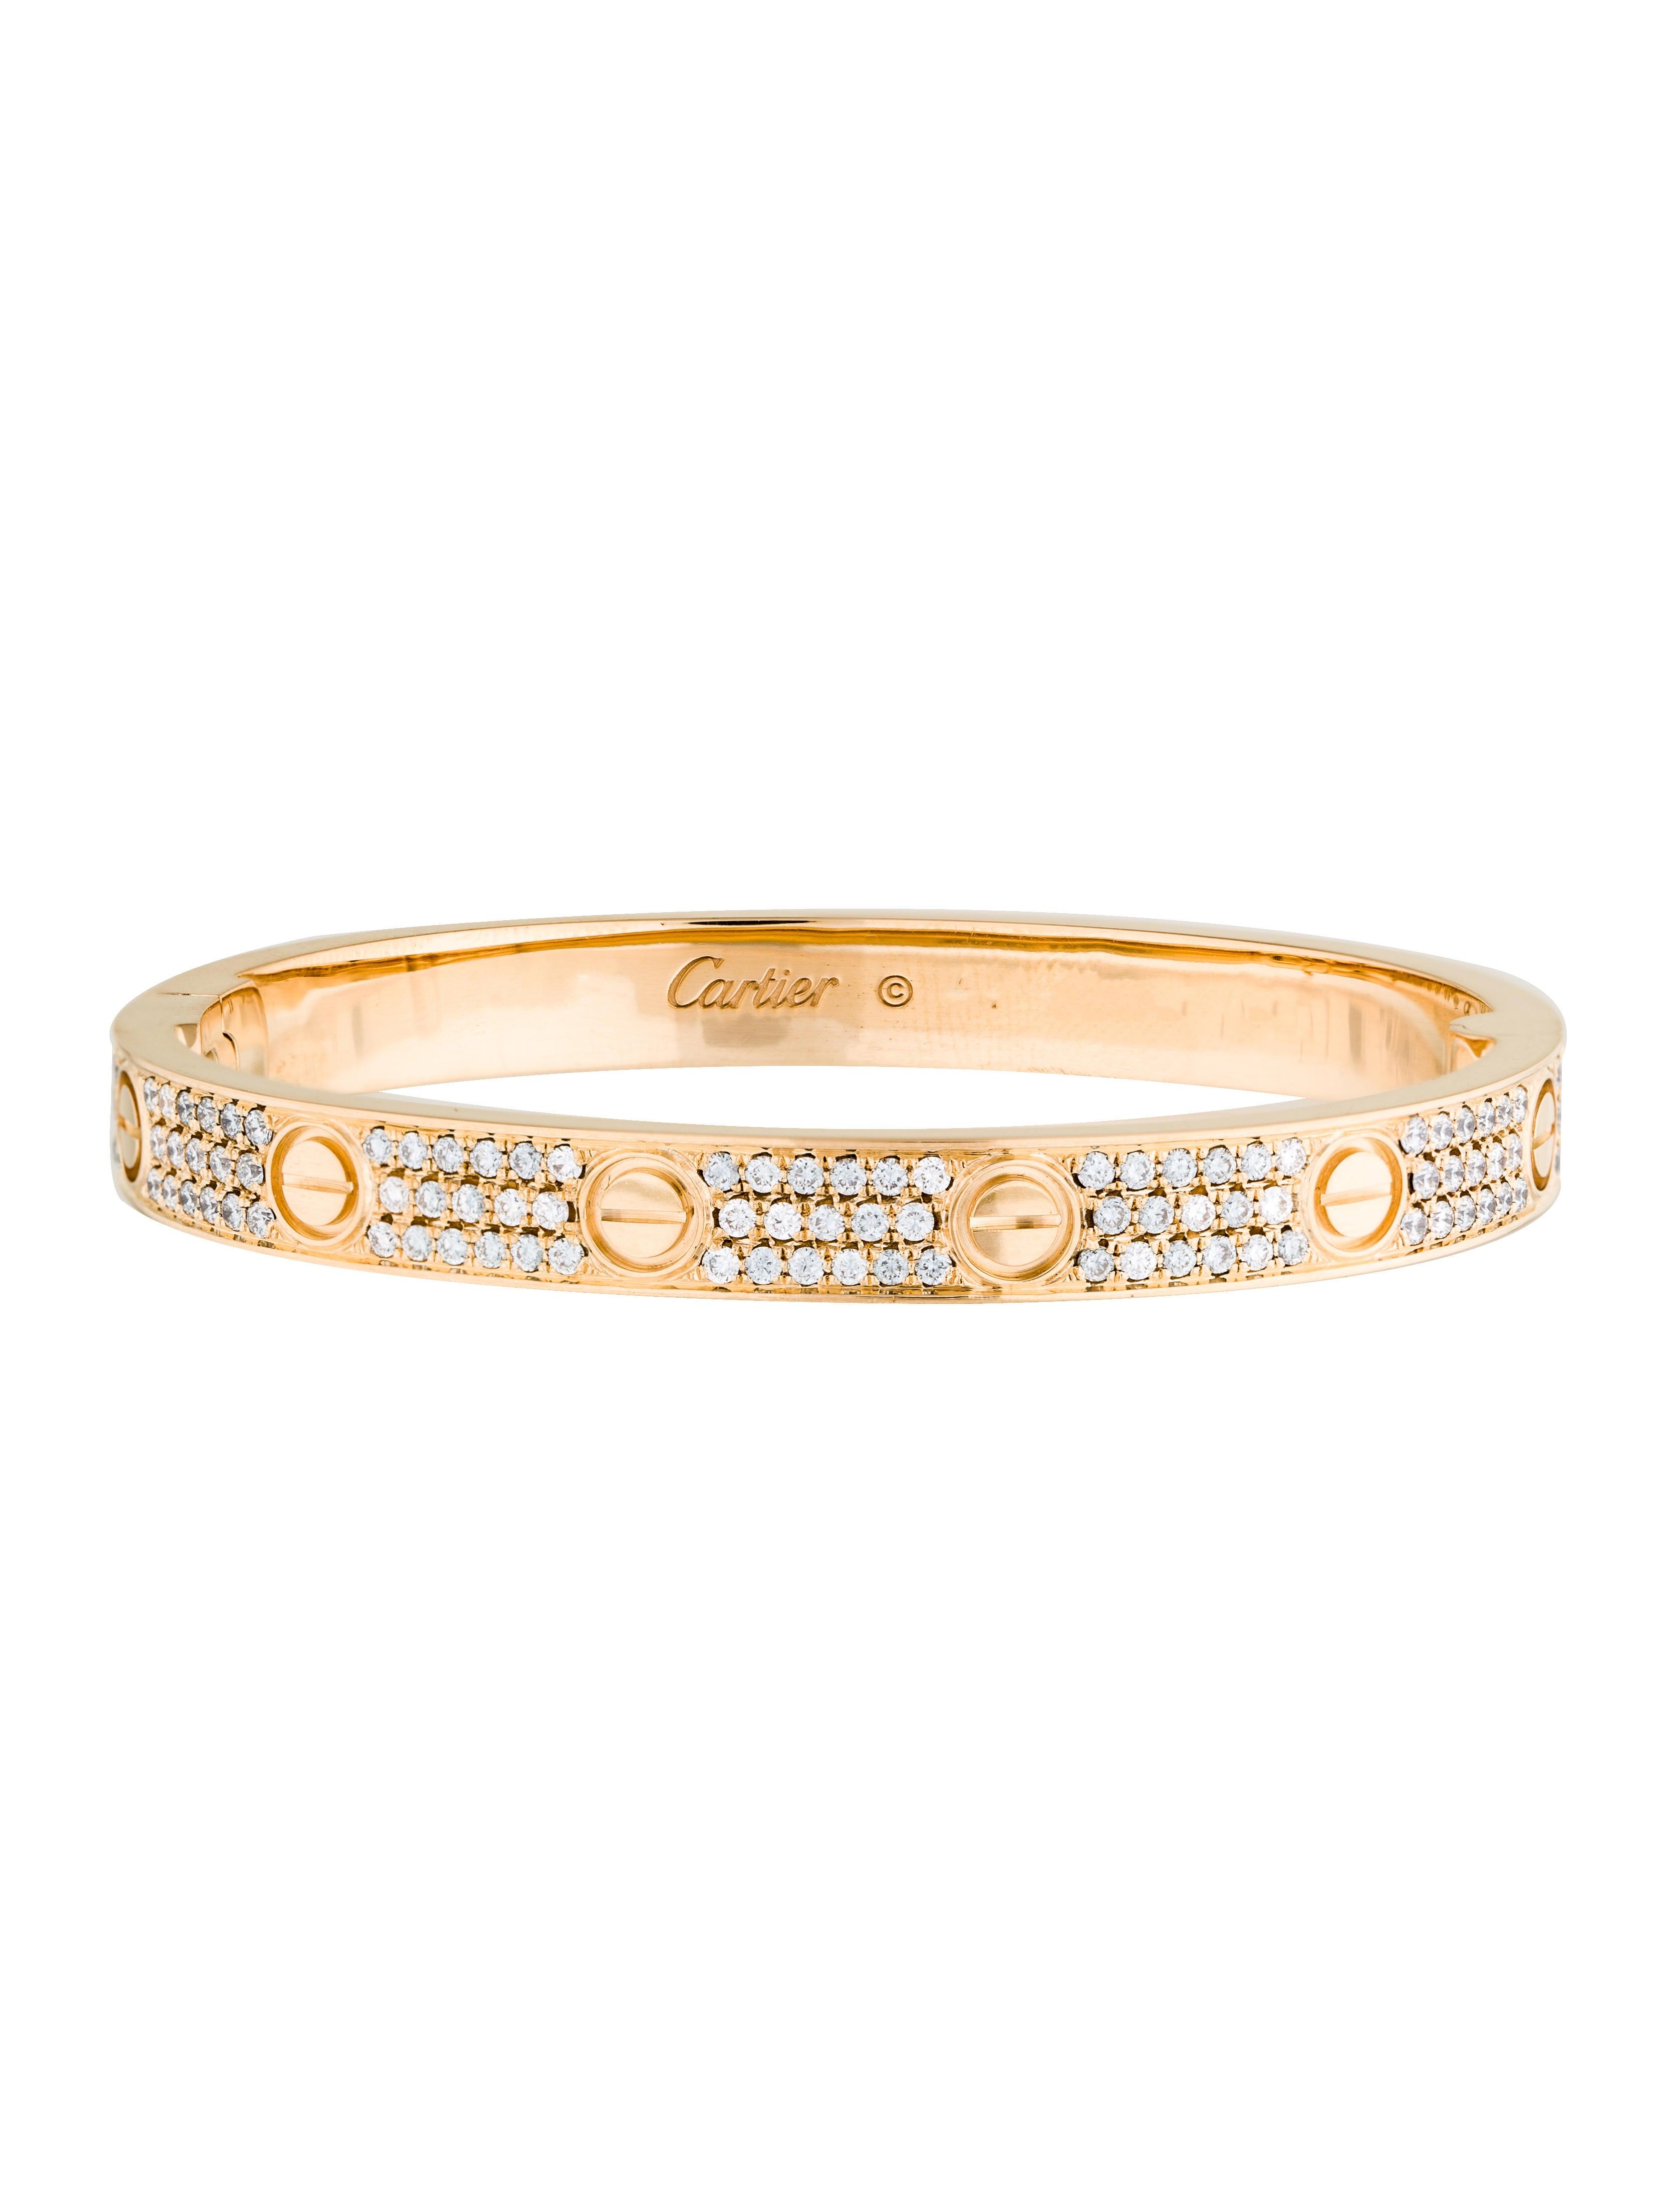 Fashion week Diamond cartier love bracelet for girls